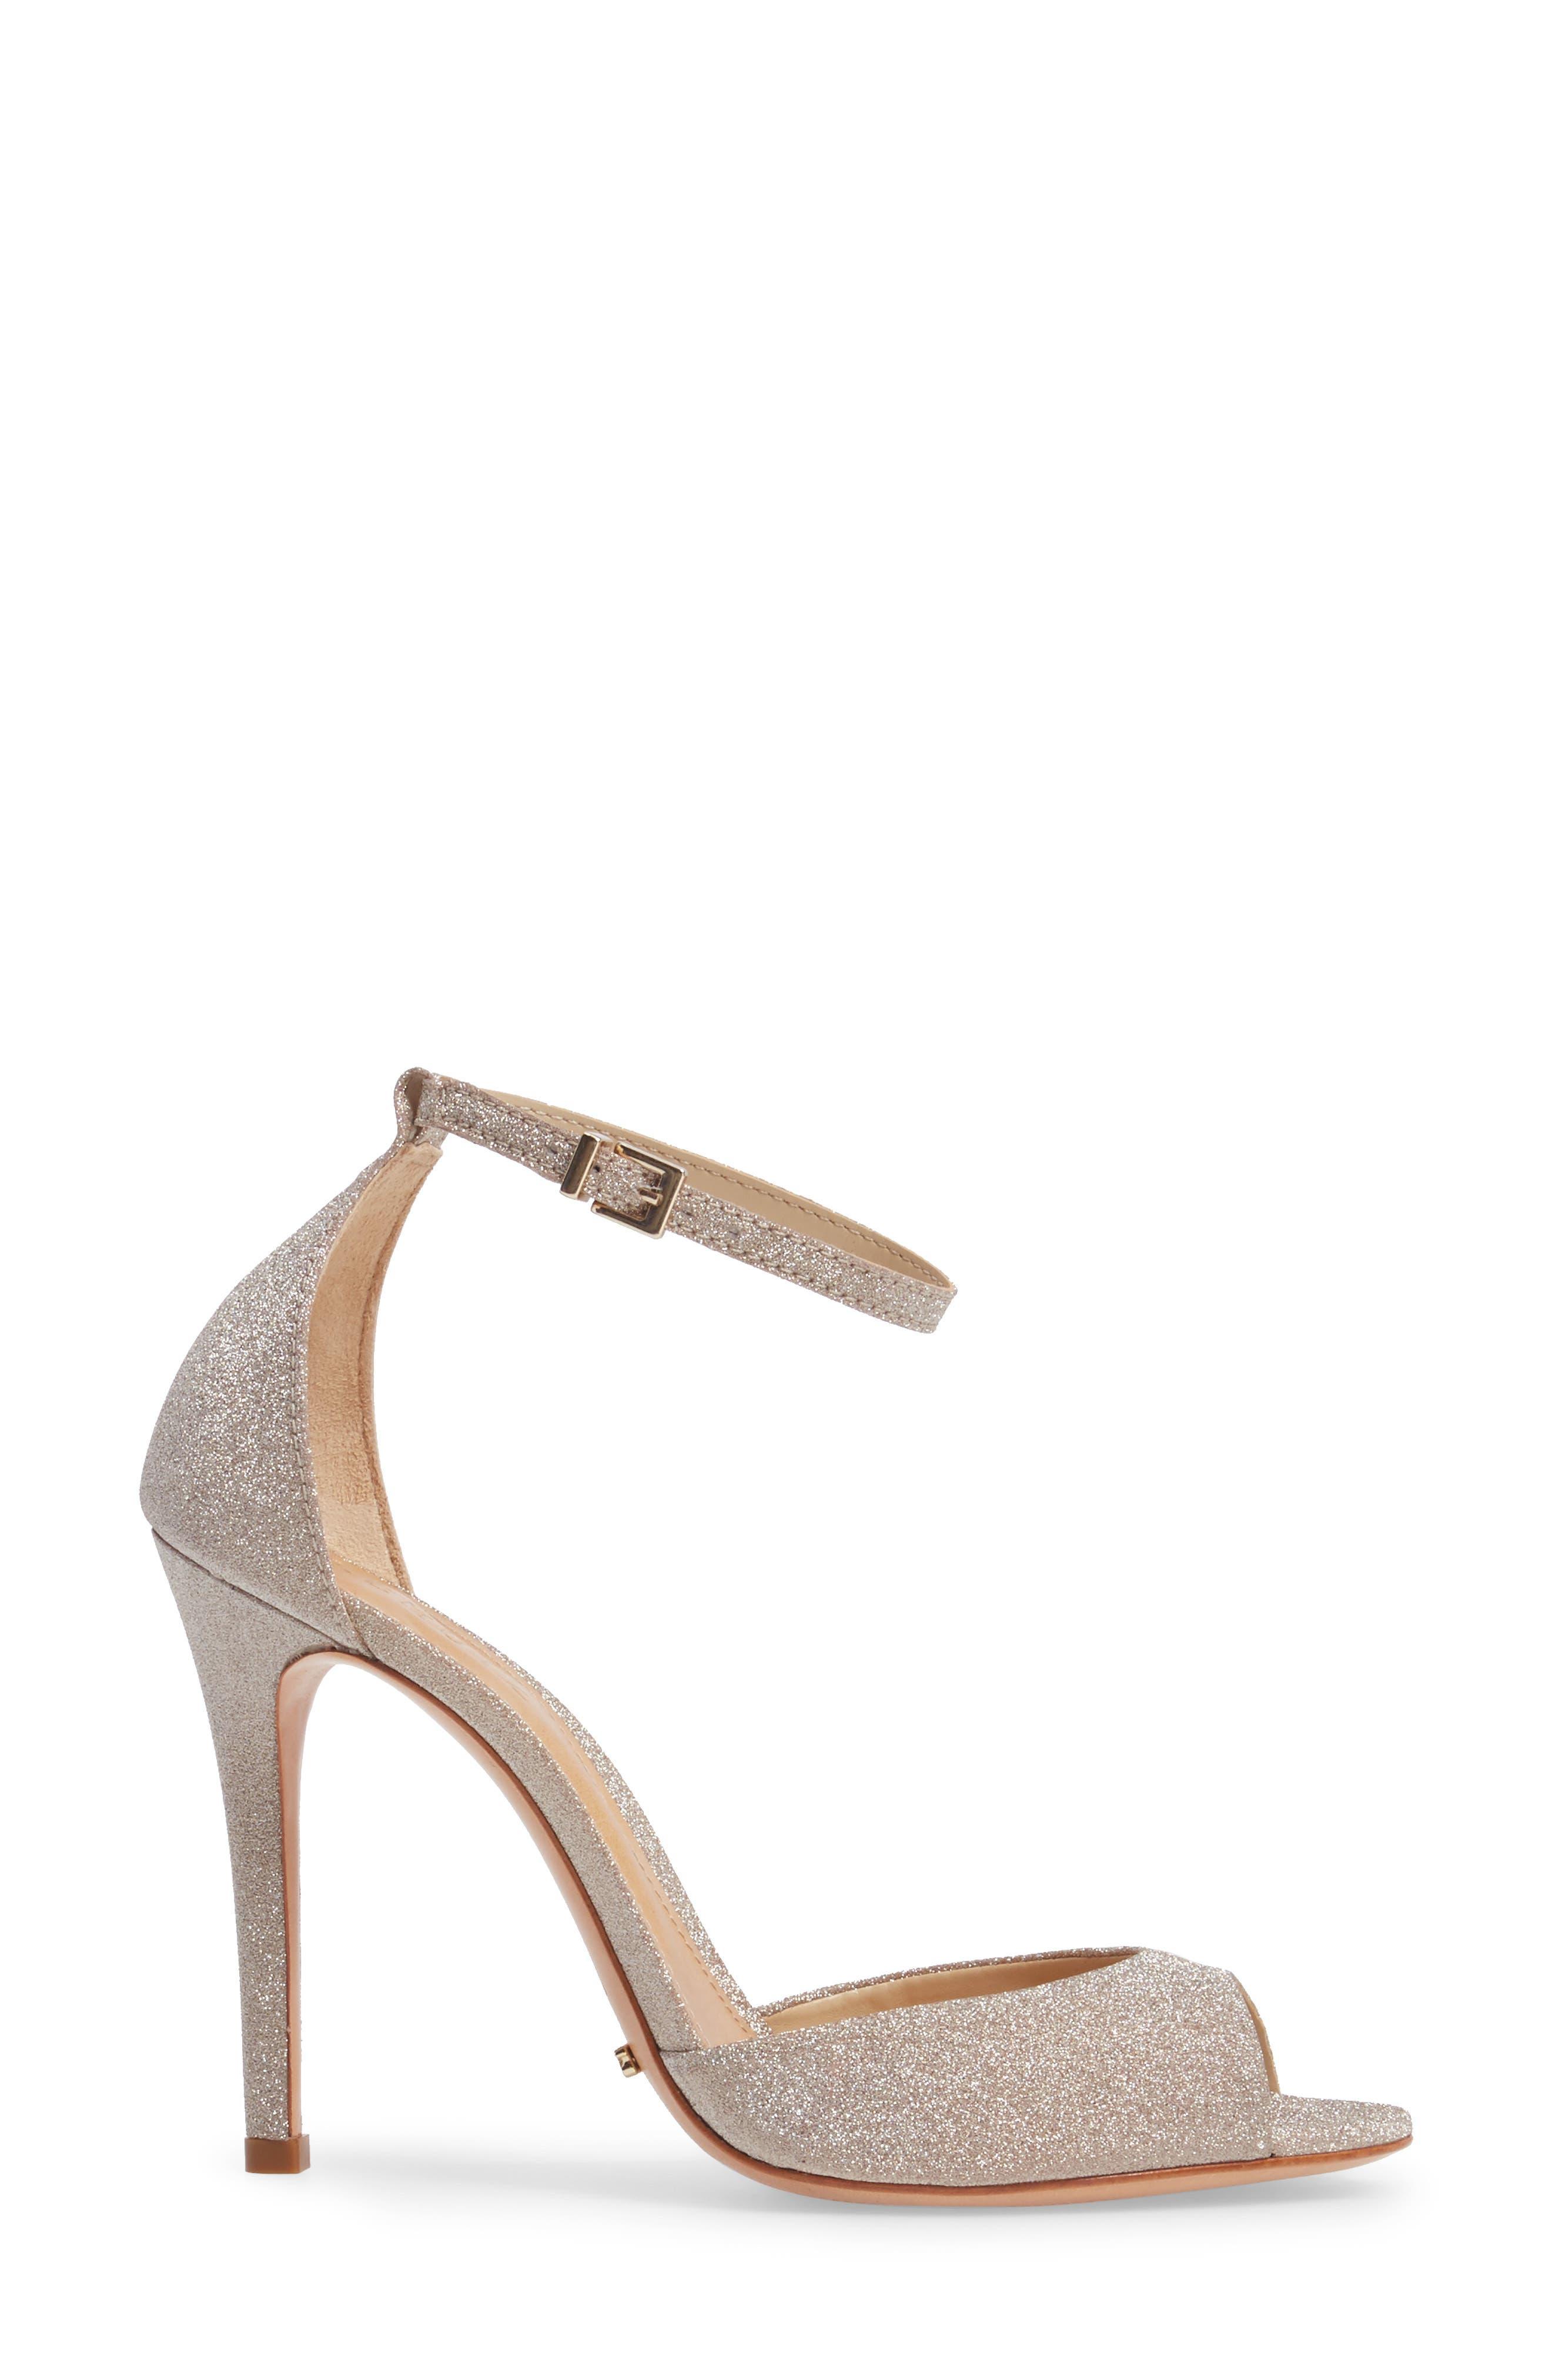 Saasha Lee Ankle Strap Sandal,                             Alternate thumbnail 3, color,                             040